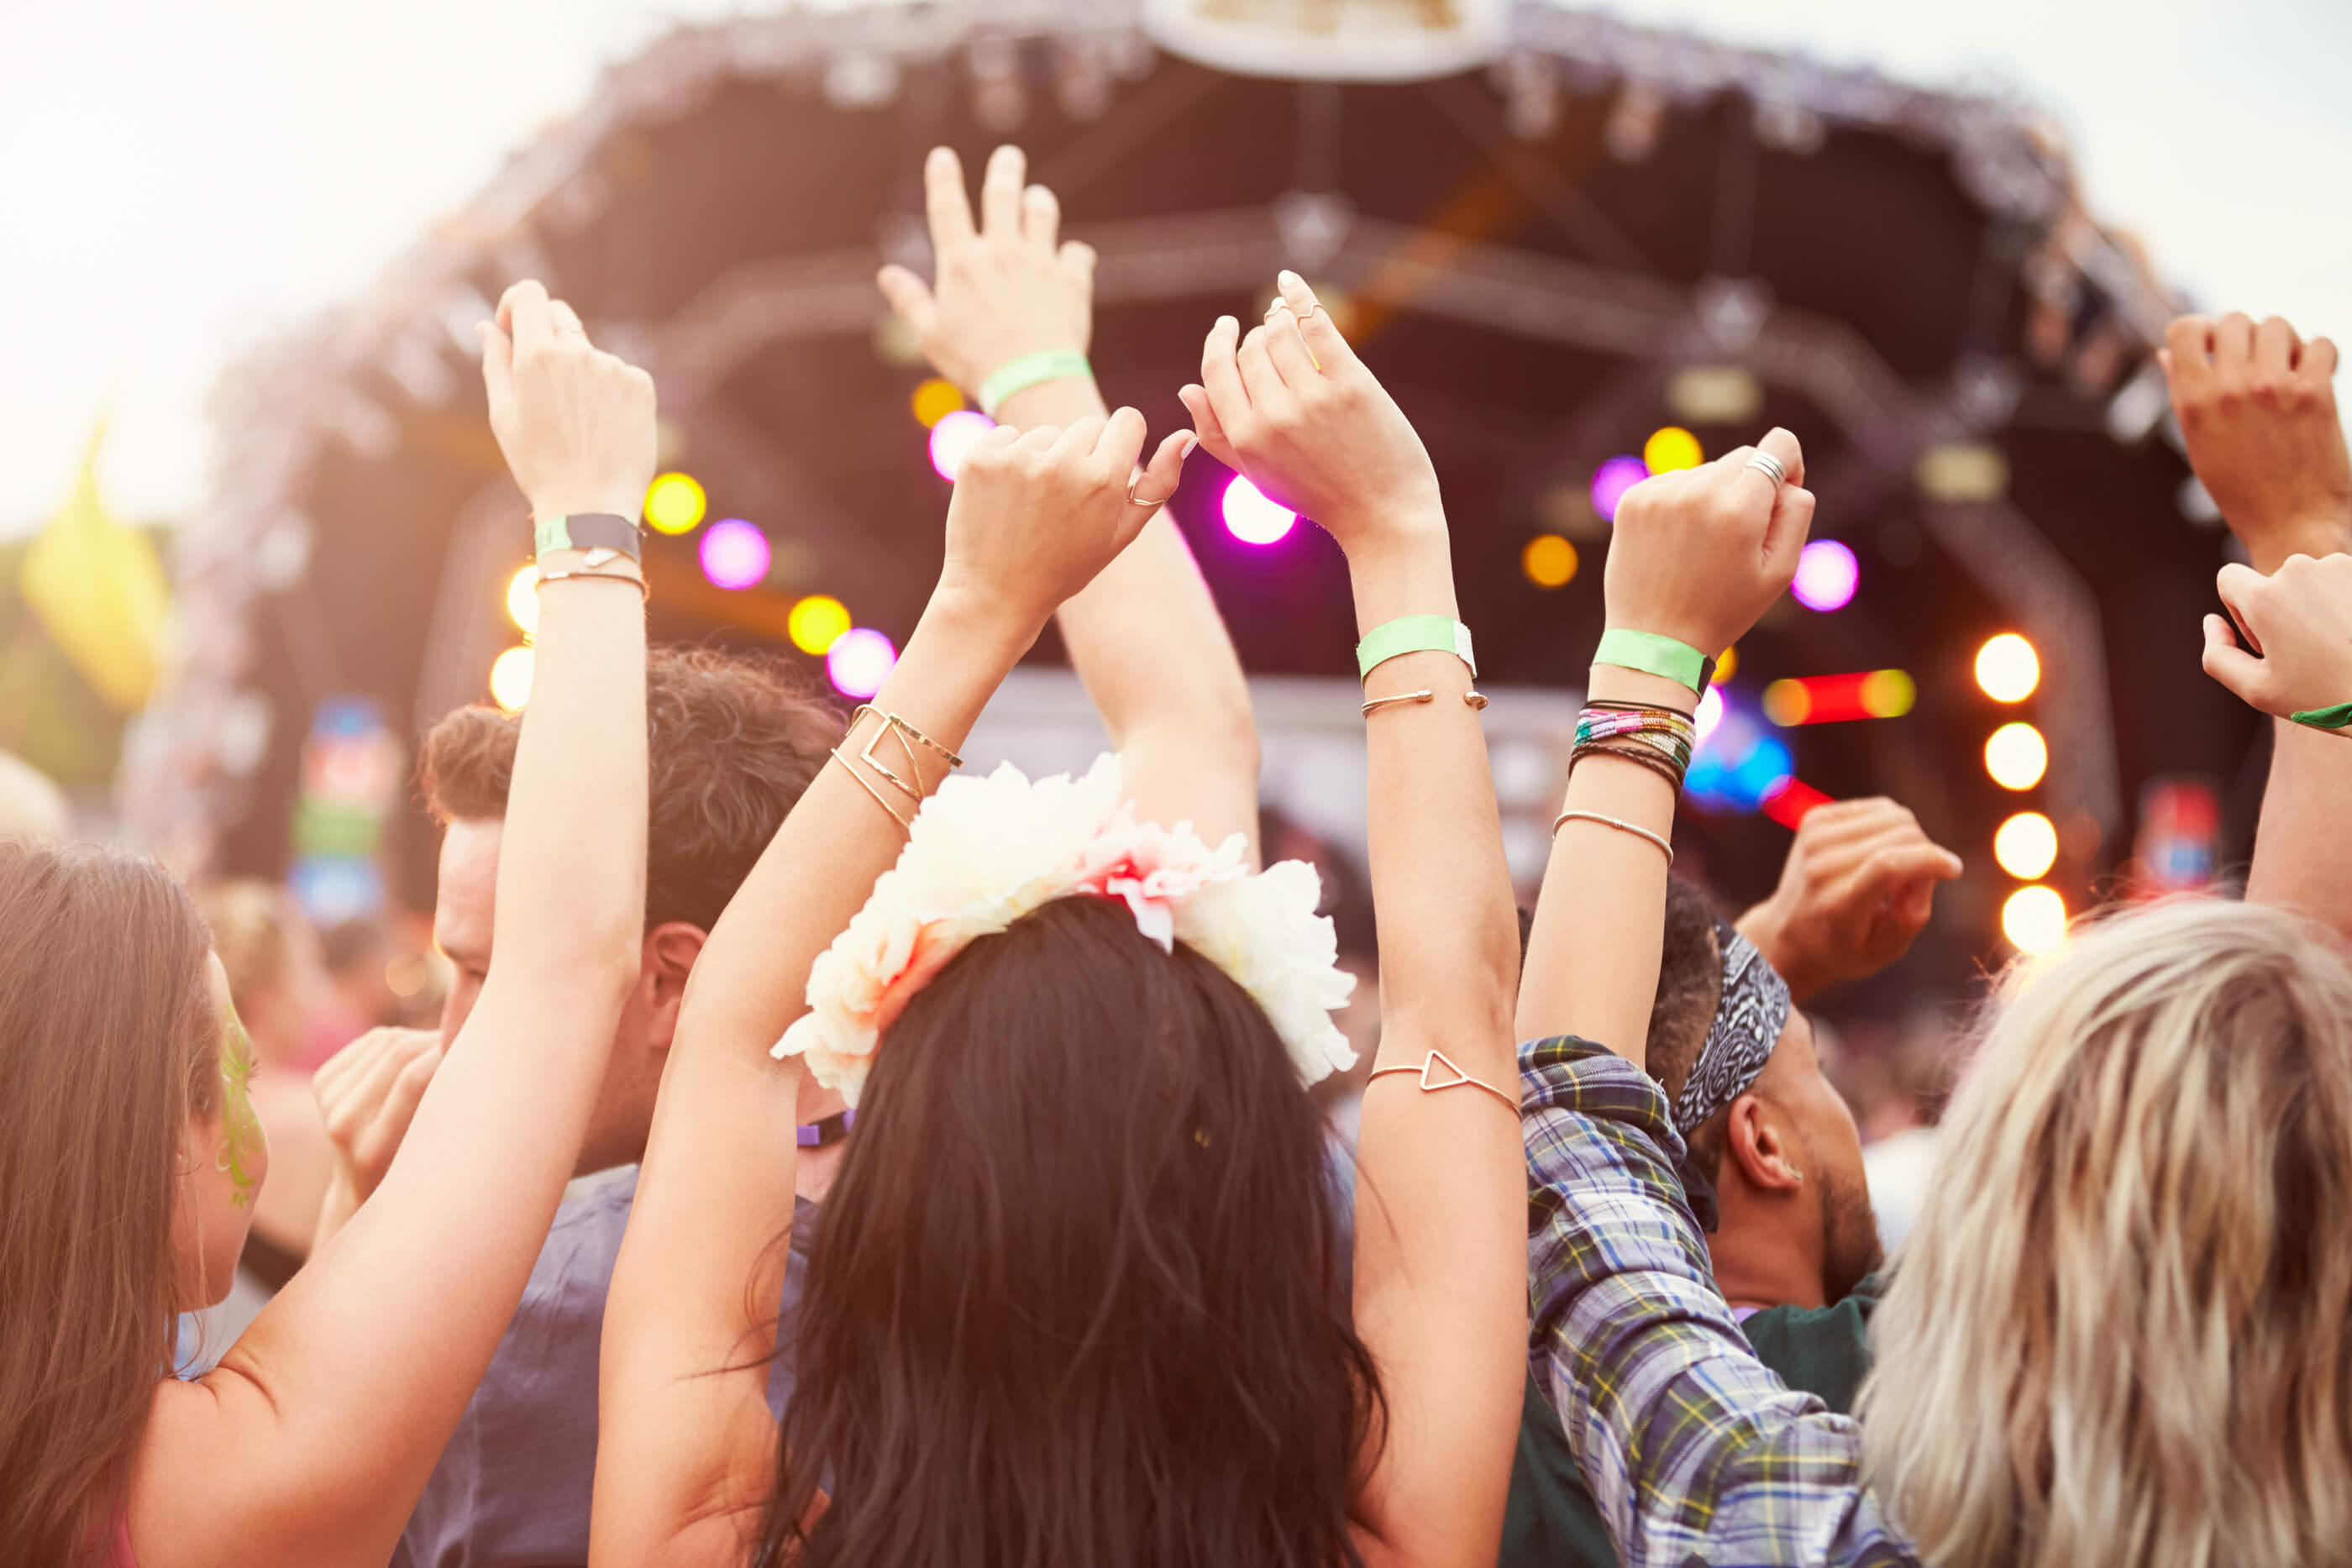 mejores-festivales-barcelona-2